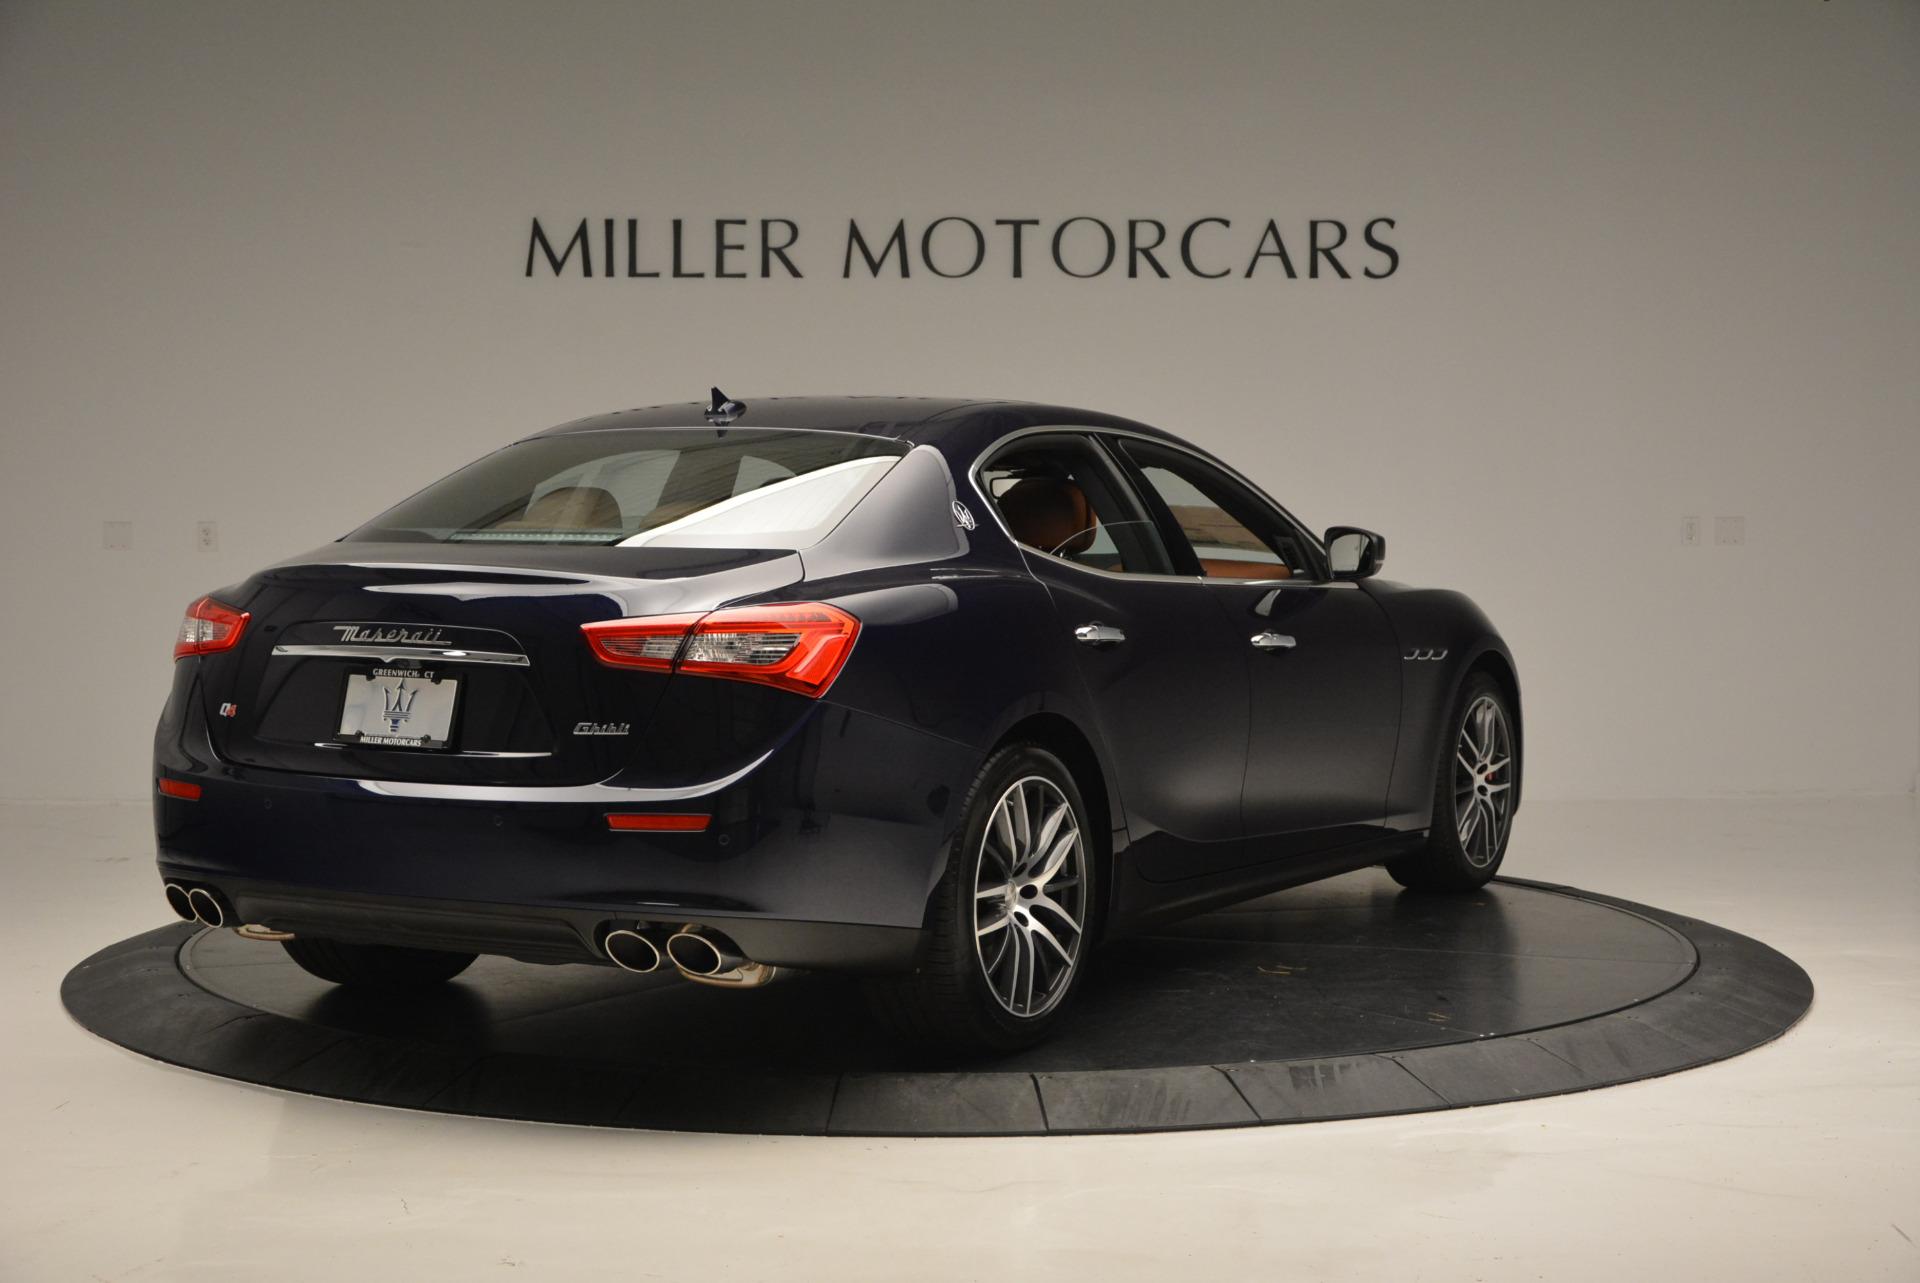 Used 2017 Maserati Ghibli S Q4 - EX Loaner For Sale In Greenwich, CT 568_p7